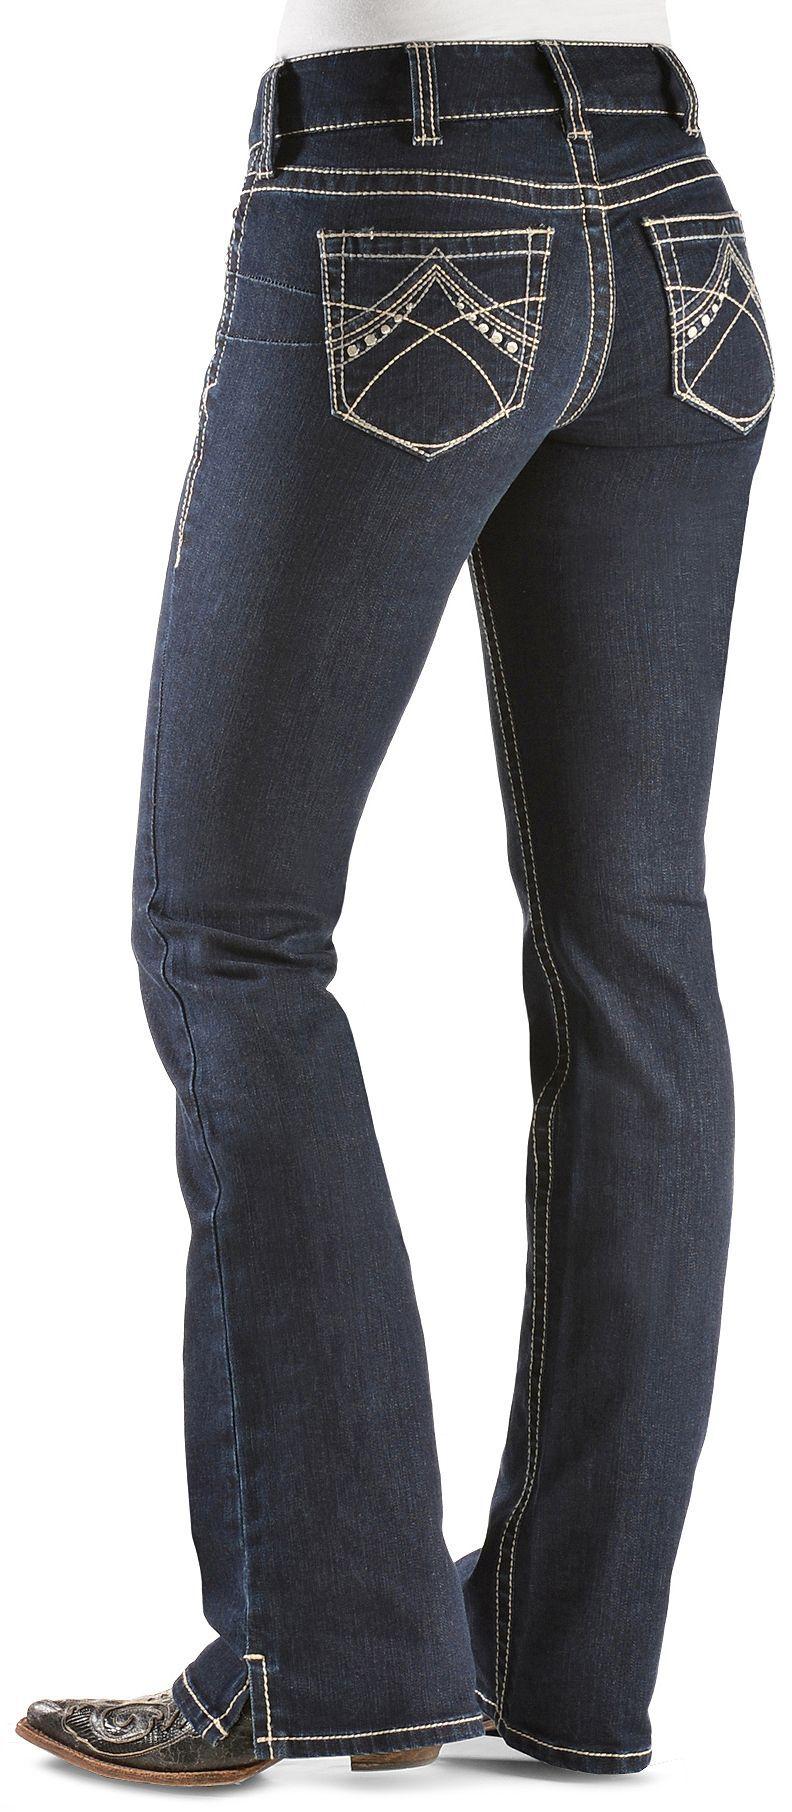 Womens dark blue bootcut jeans